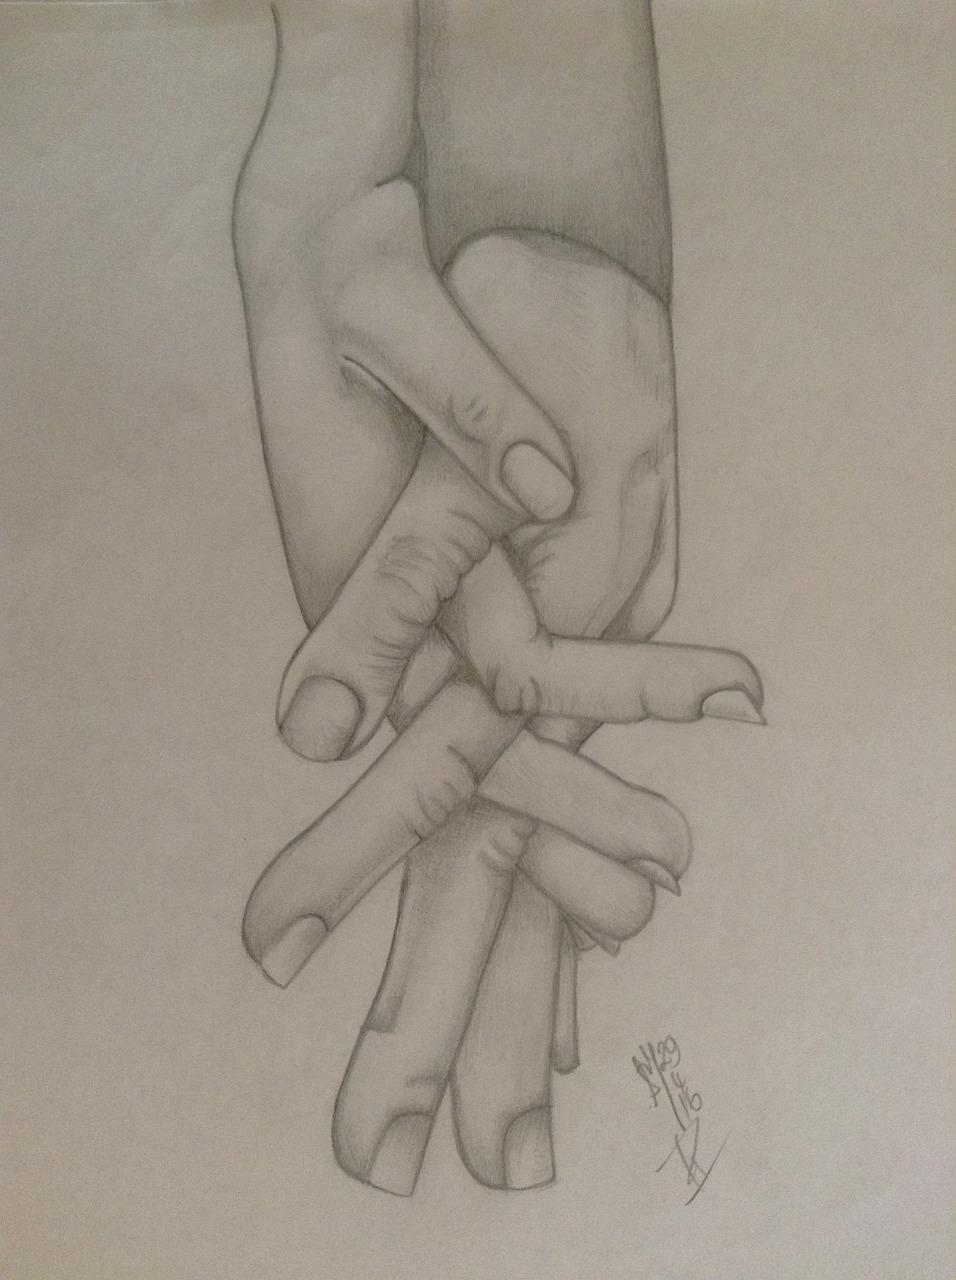 Рисунок рука в руке карандашом фото